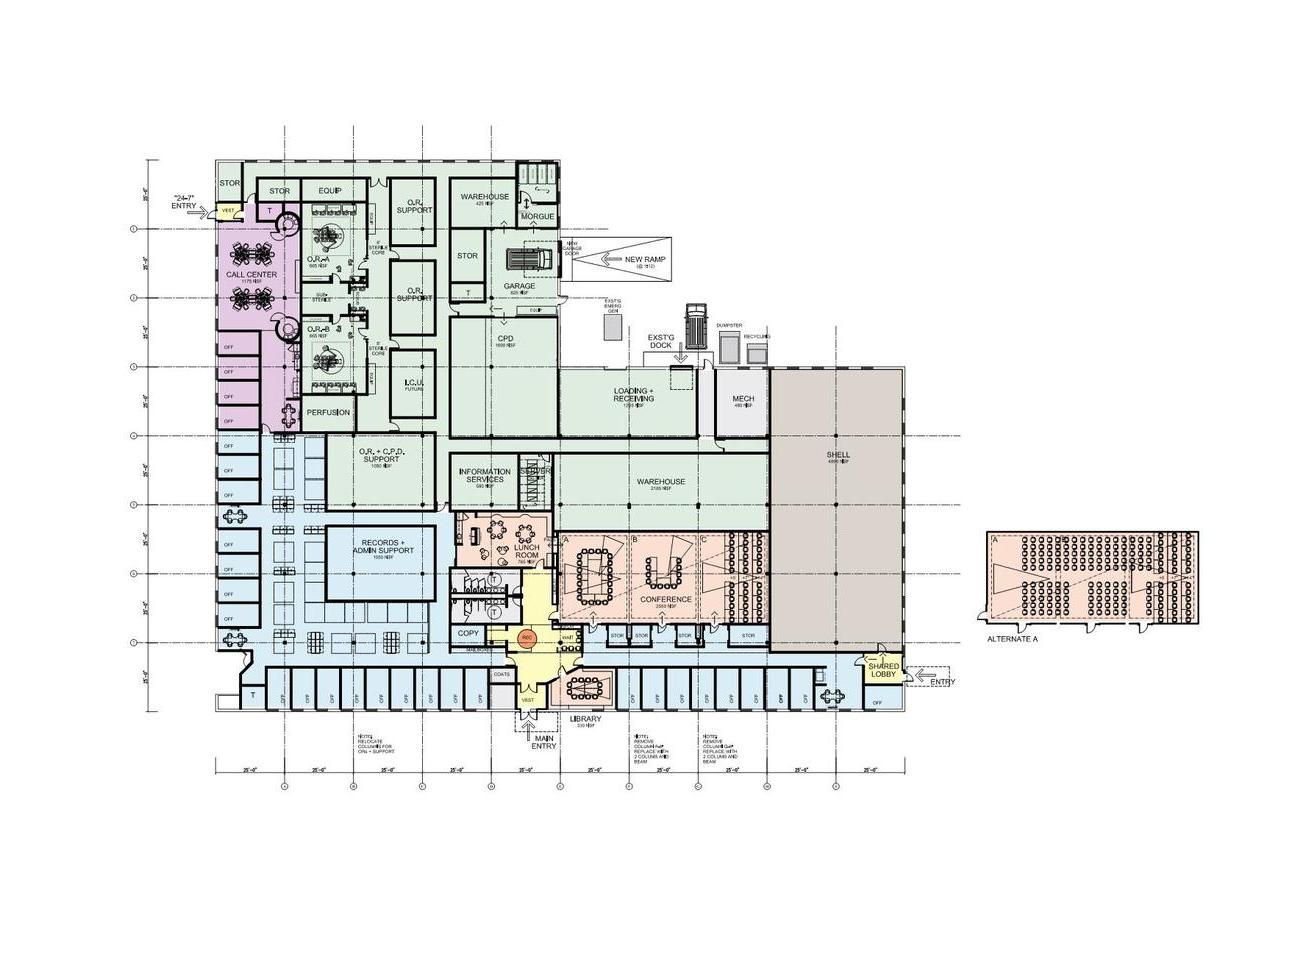 NEOB - Headquarters 6, plan.jpg